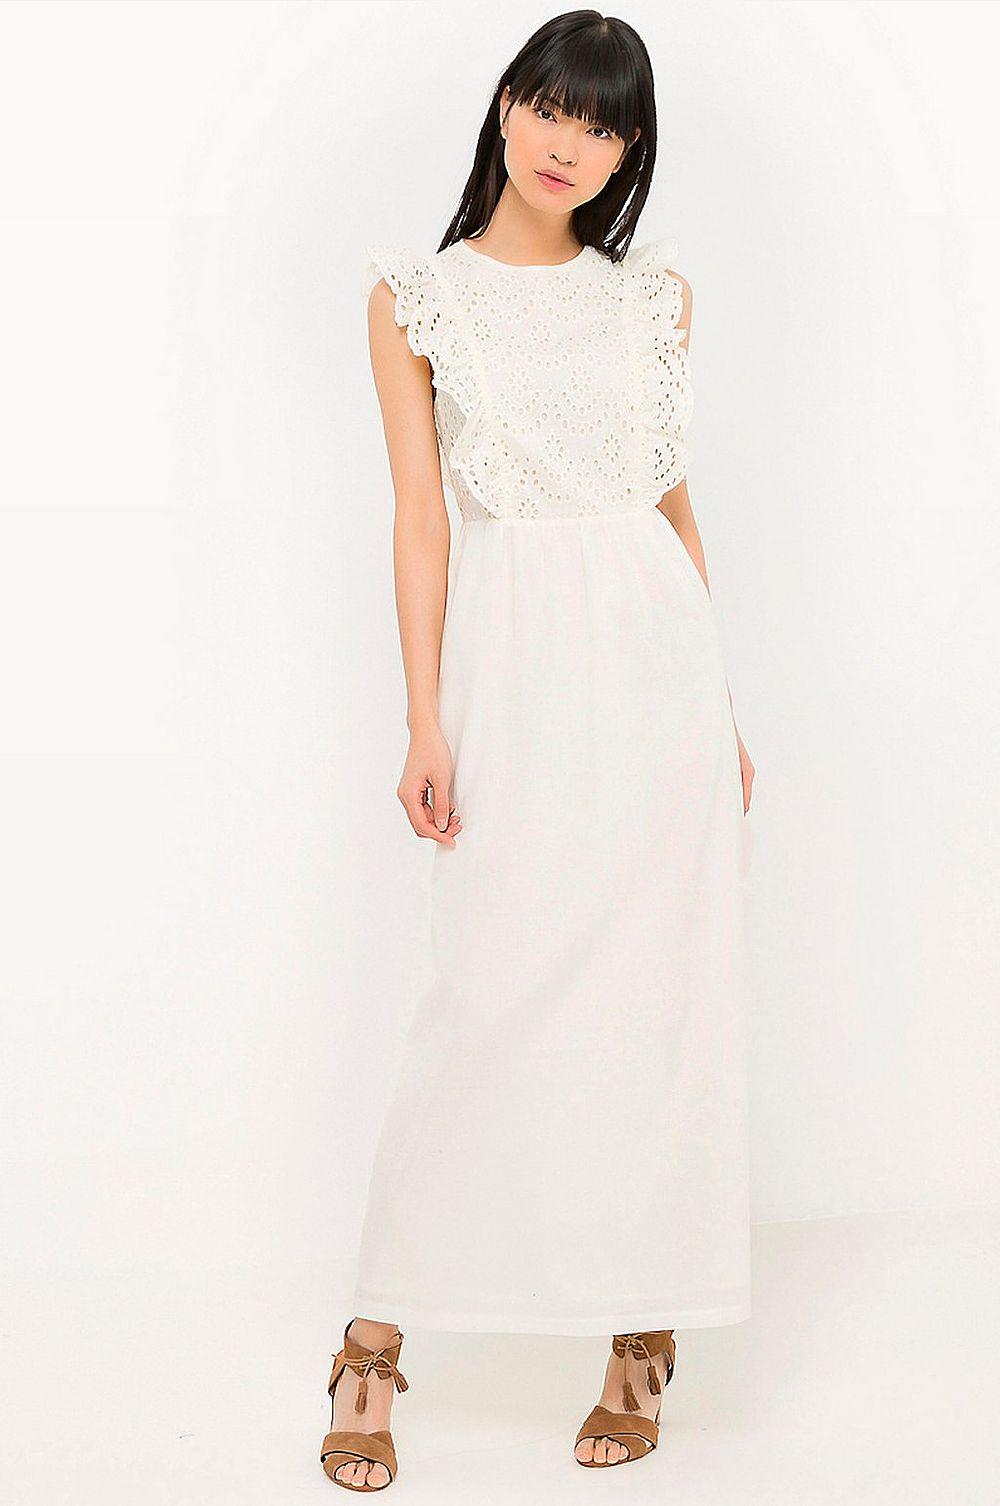 vit klänning.jpeg